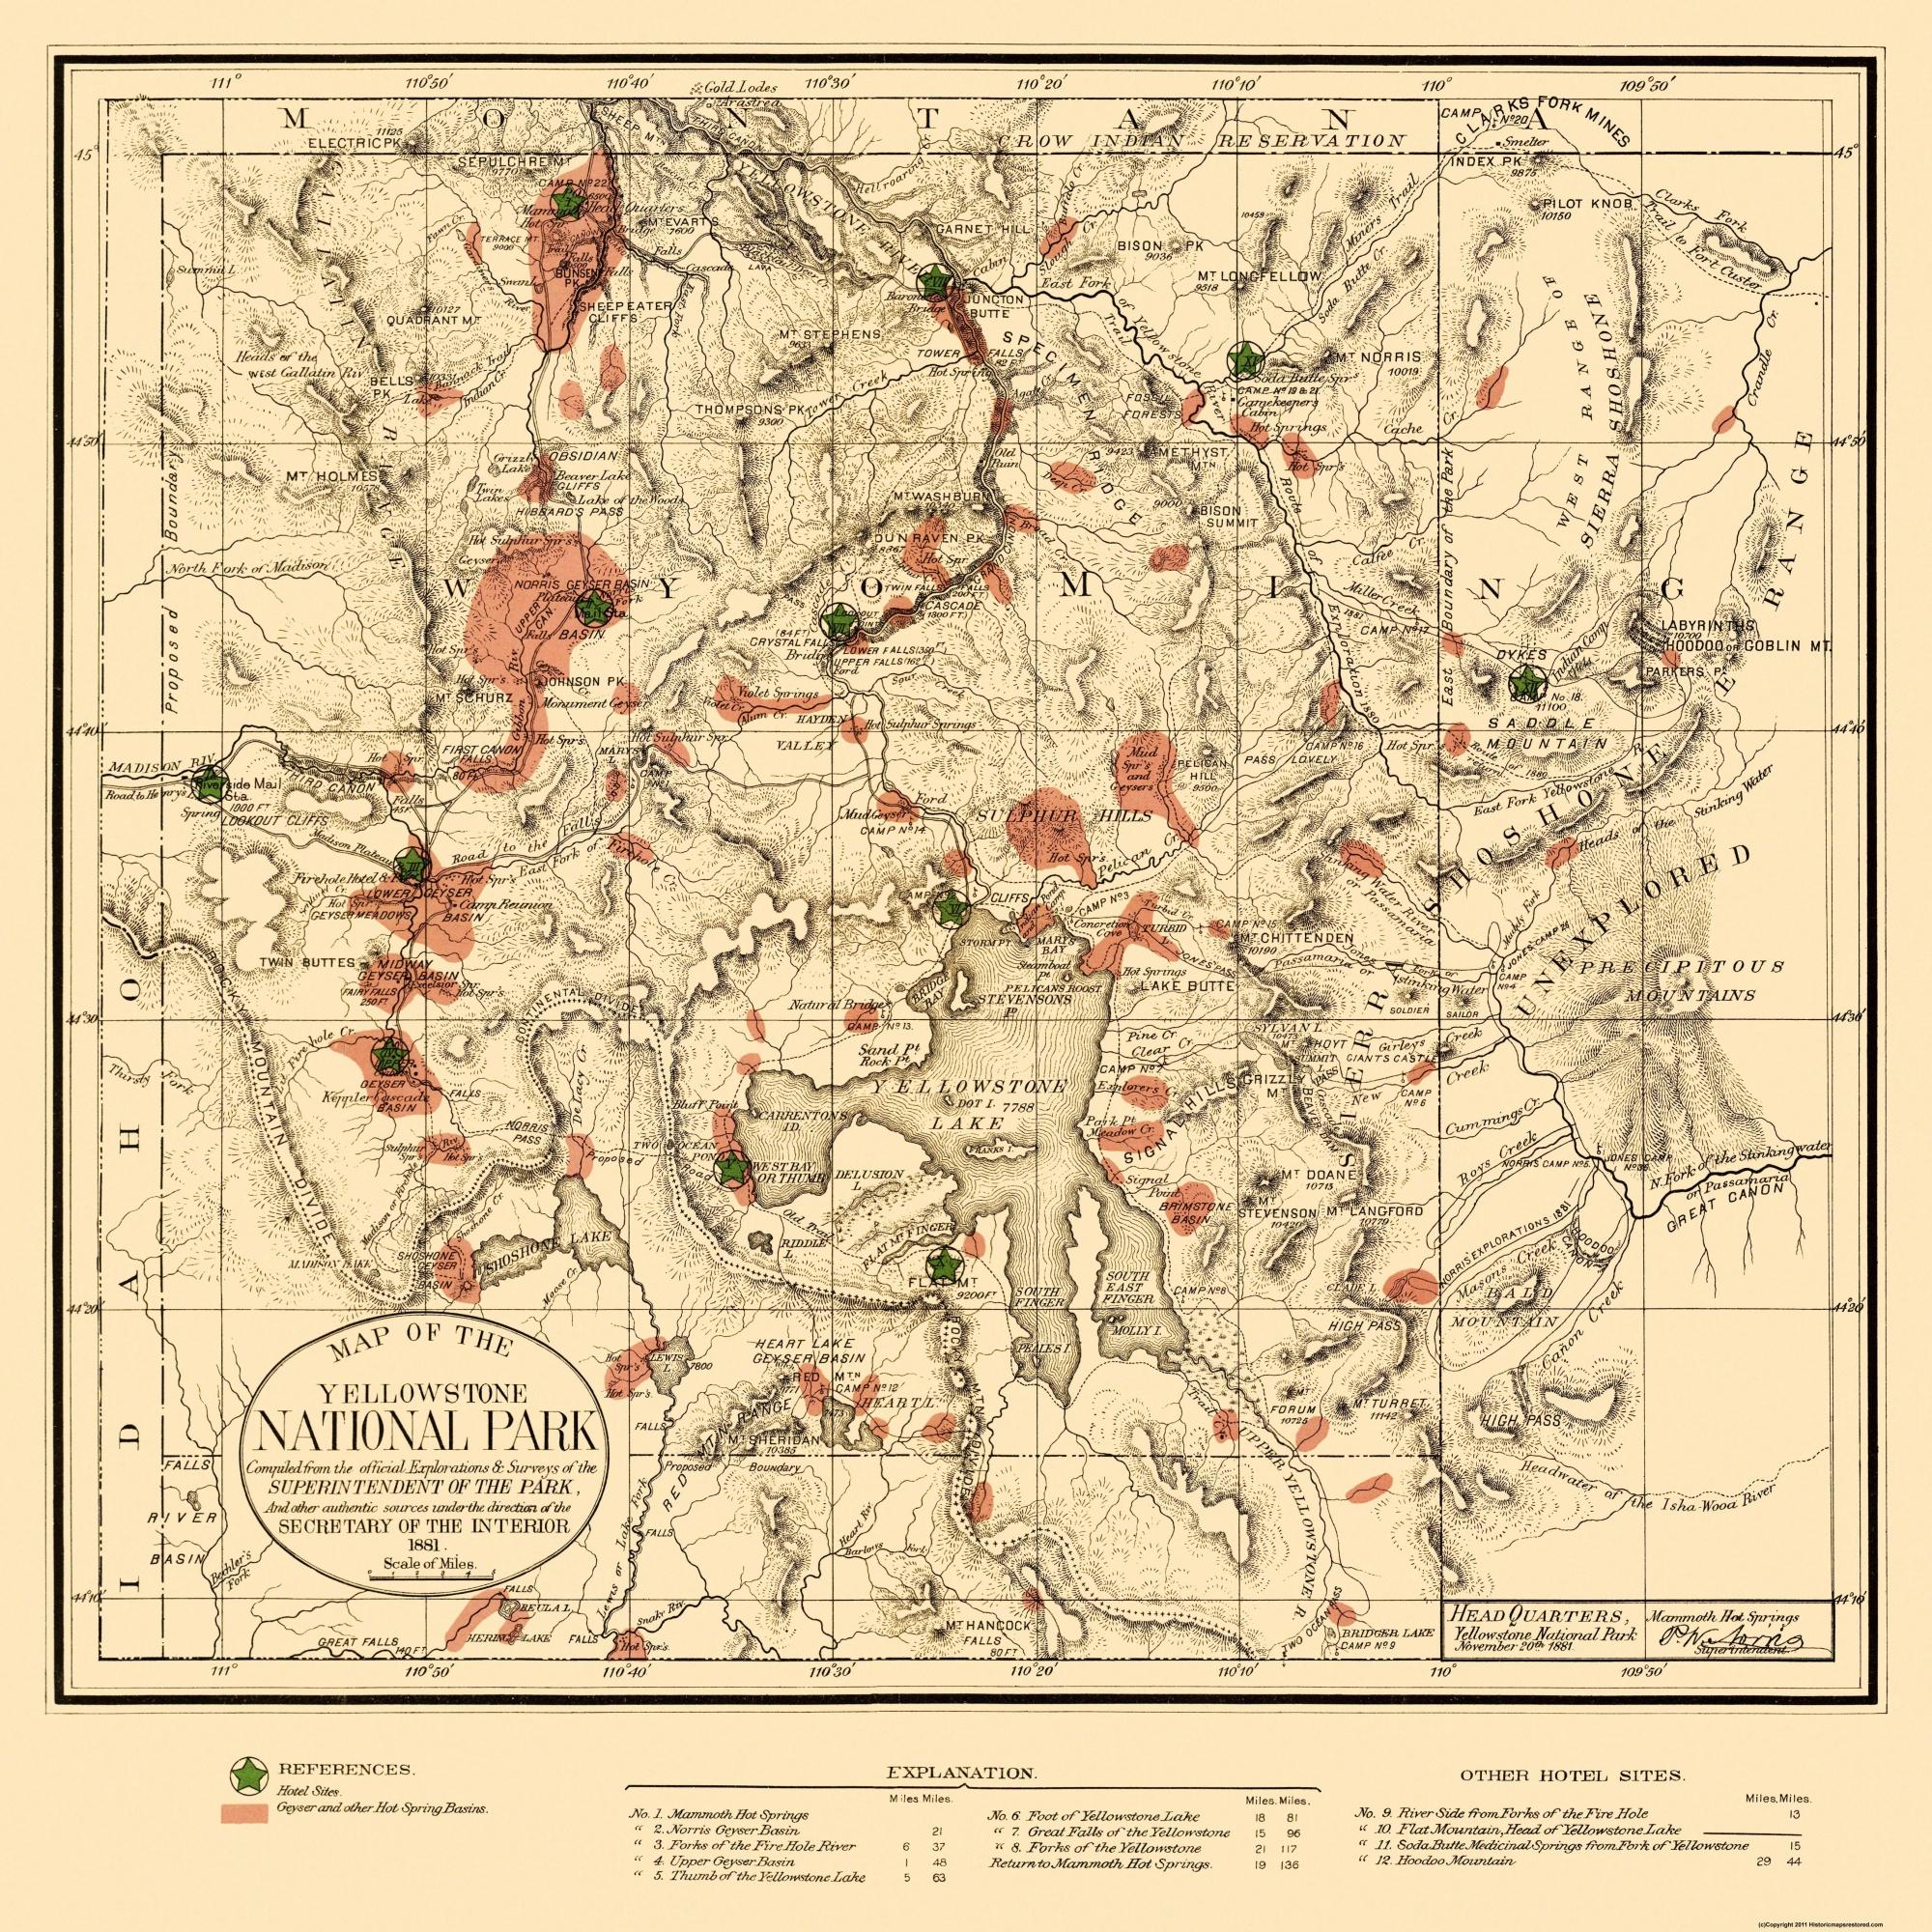 Yellowstone National Park - US Interior 1881 - 23 x 23 on willamette river map usa, chicago map usa, montana map usa, st. louis map usa, idaho map usa, wyoming map usa, black hills map usa, cheyenne map usa, mount mckinley map usa, utah map usa, united states map usa, national park service map usa, clearwater national forest map usa, austin map usa, yellowstone river map usa, olympic mountains map usa, boise map usa, yale university map usa, evansville map usa, mt. rainier national park on map of usa,